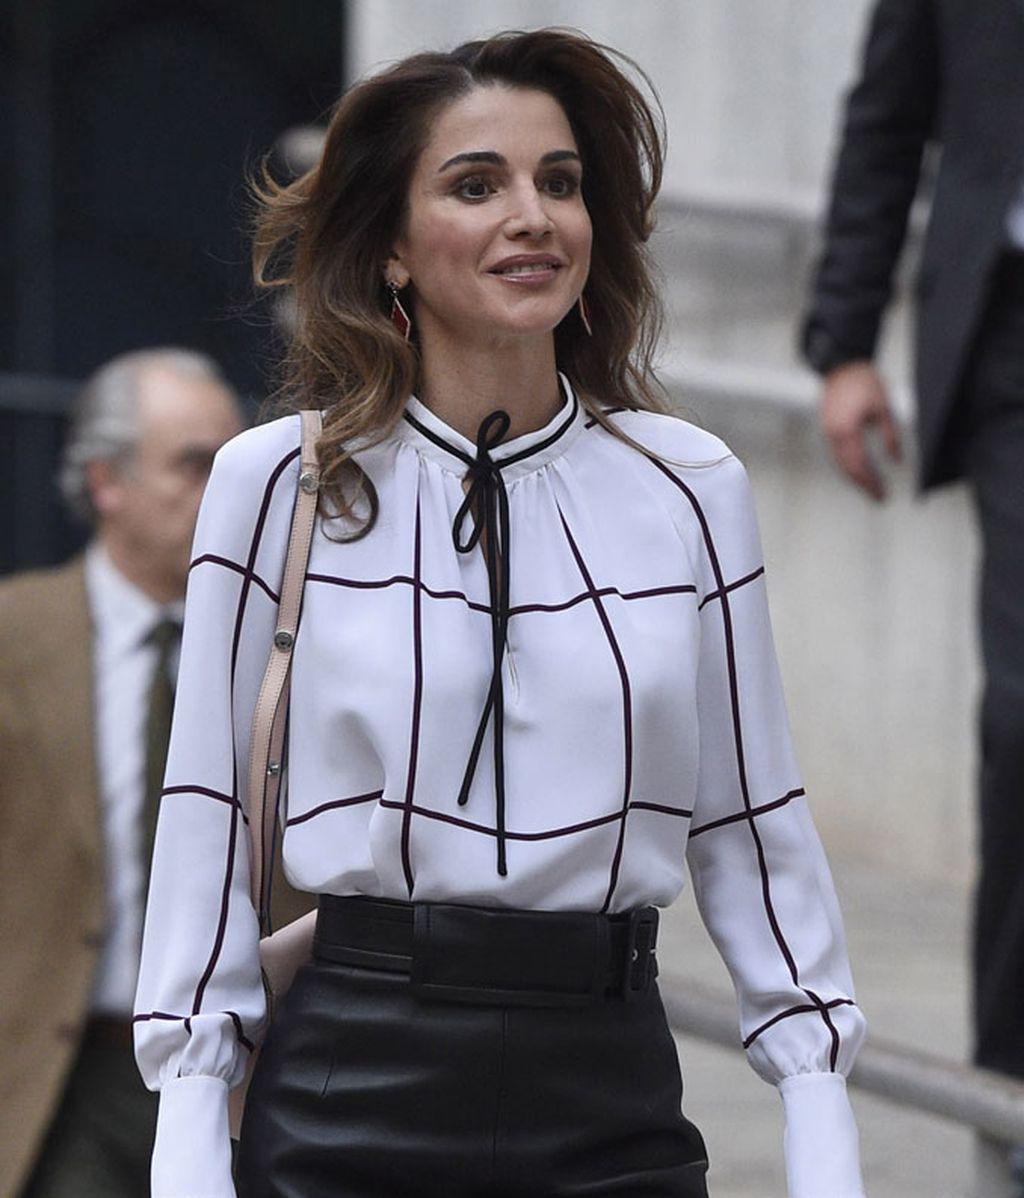 Rania estilo 'working girl'